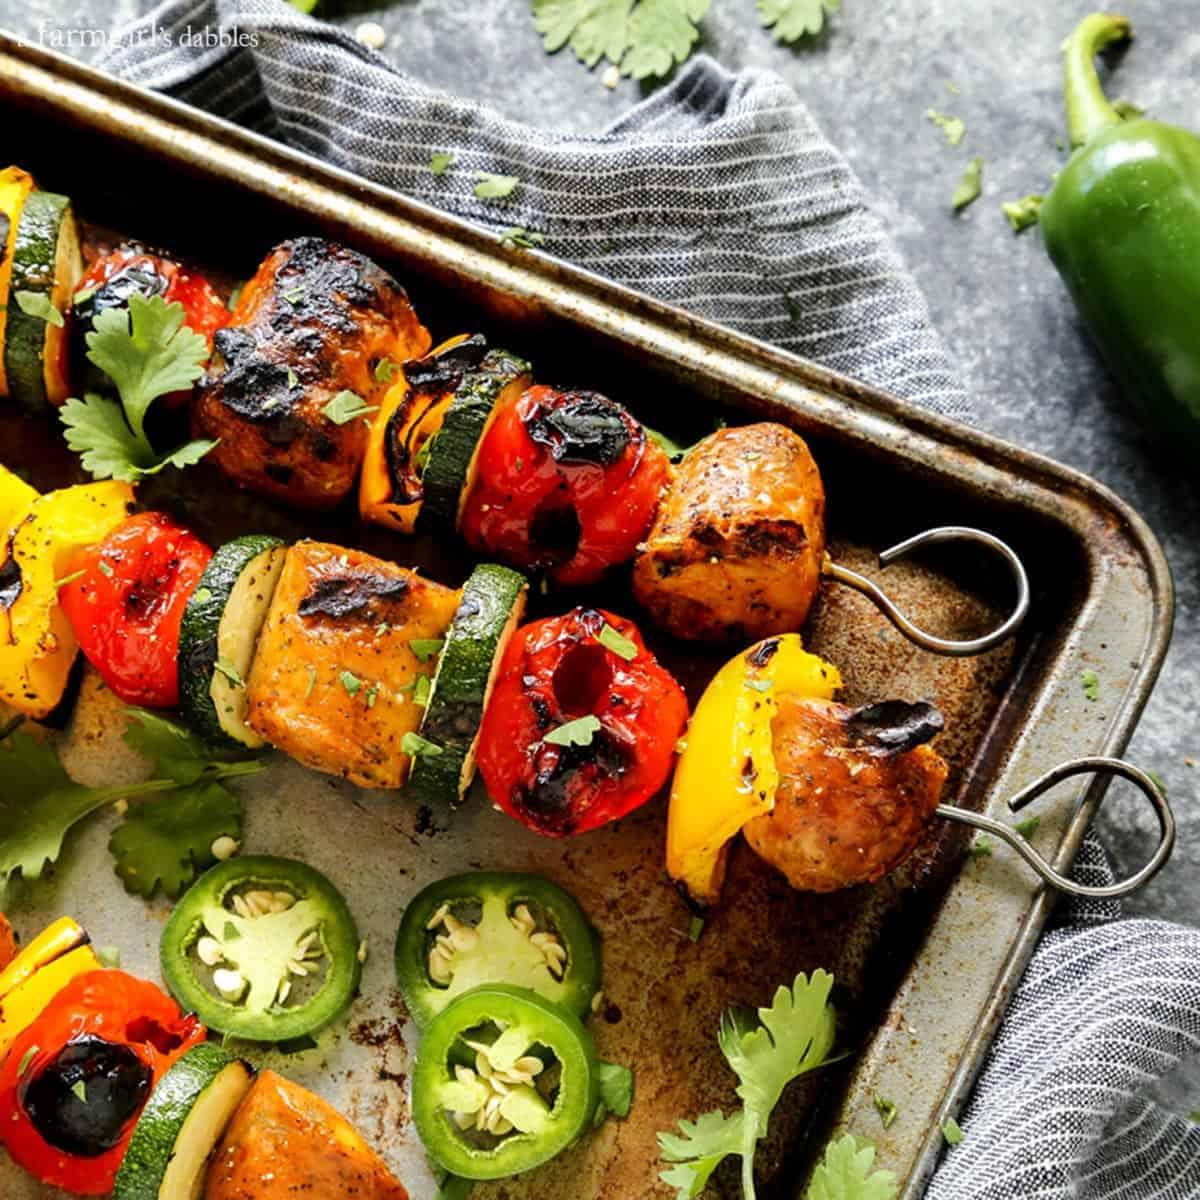 Grilled Jalapeno Cheddar Chicken Sausage Kebabs with Peppadews